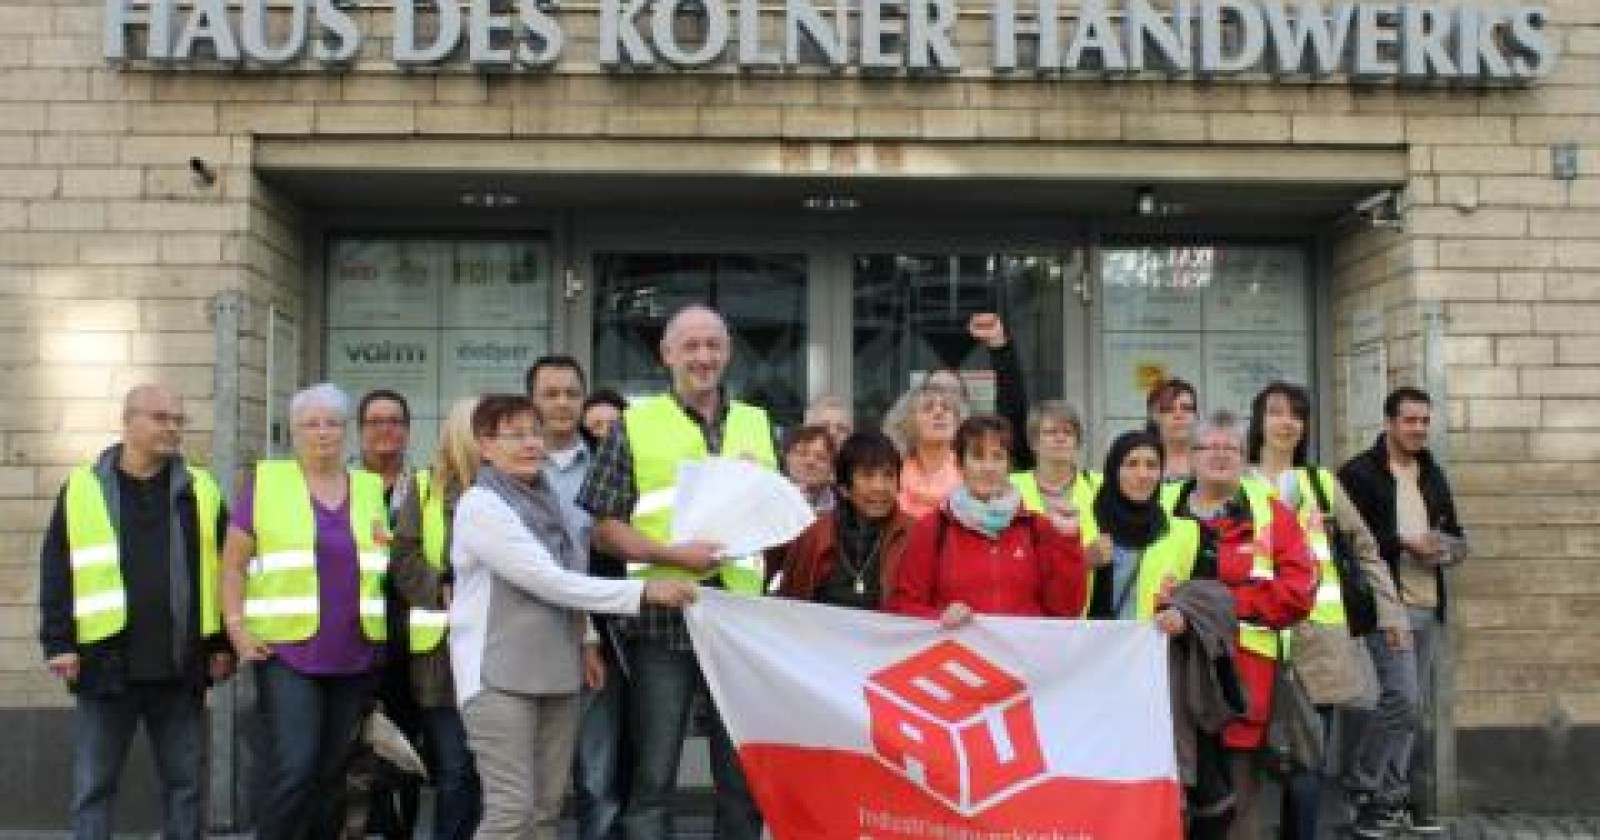 1700 Unterschriften gegen Turboputzen - Landesinnung NRW verweigert Annahme